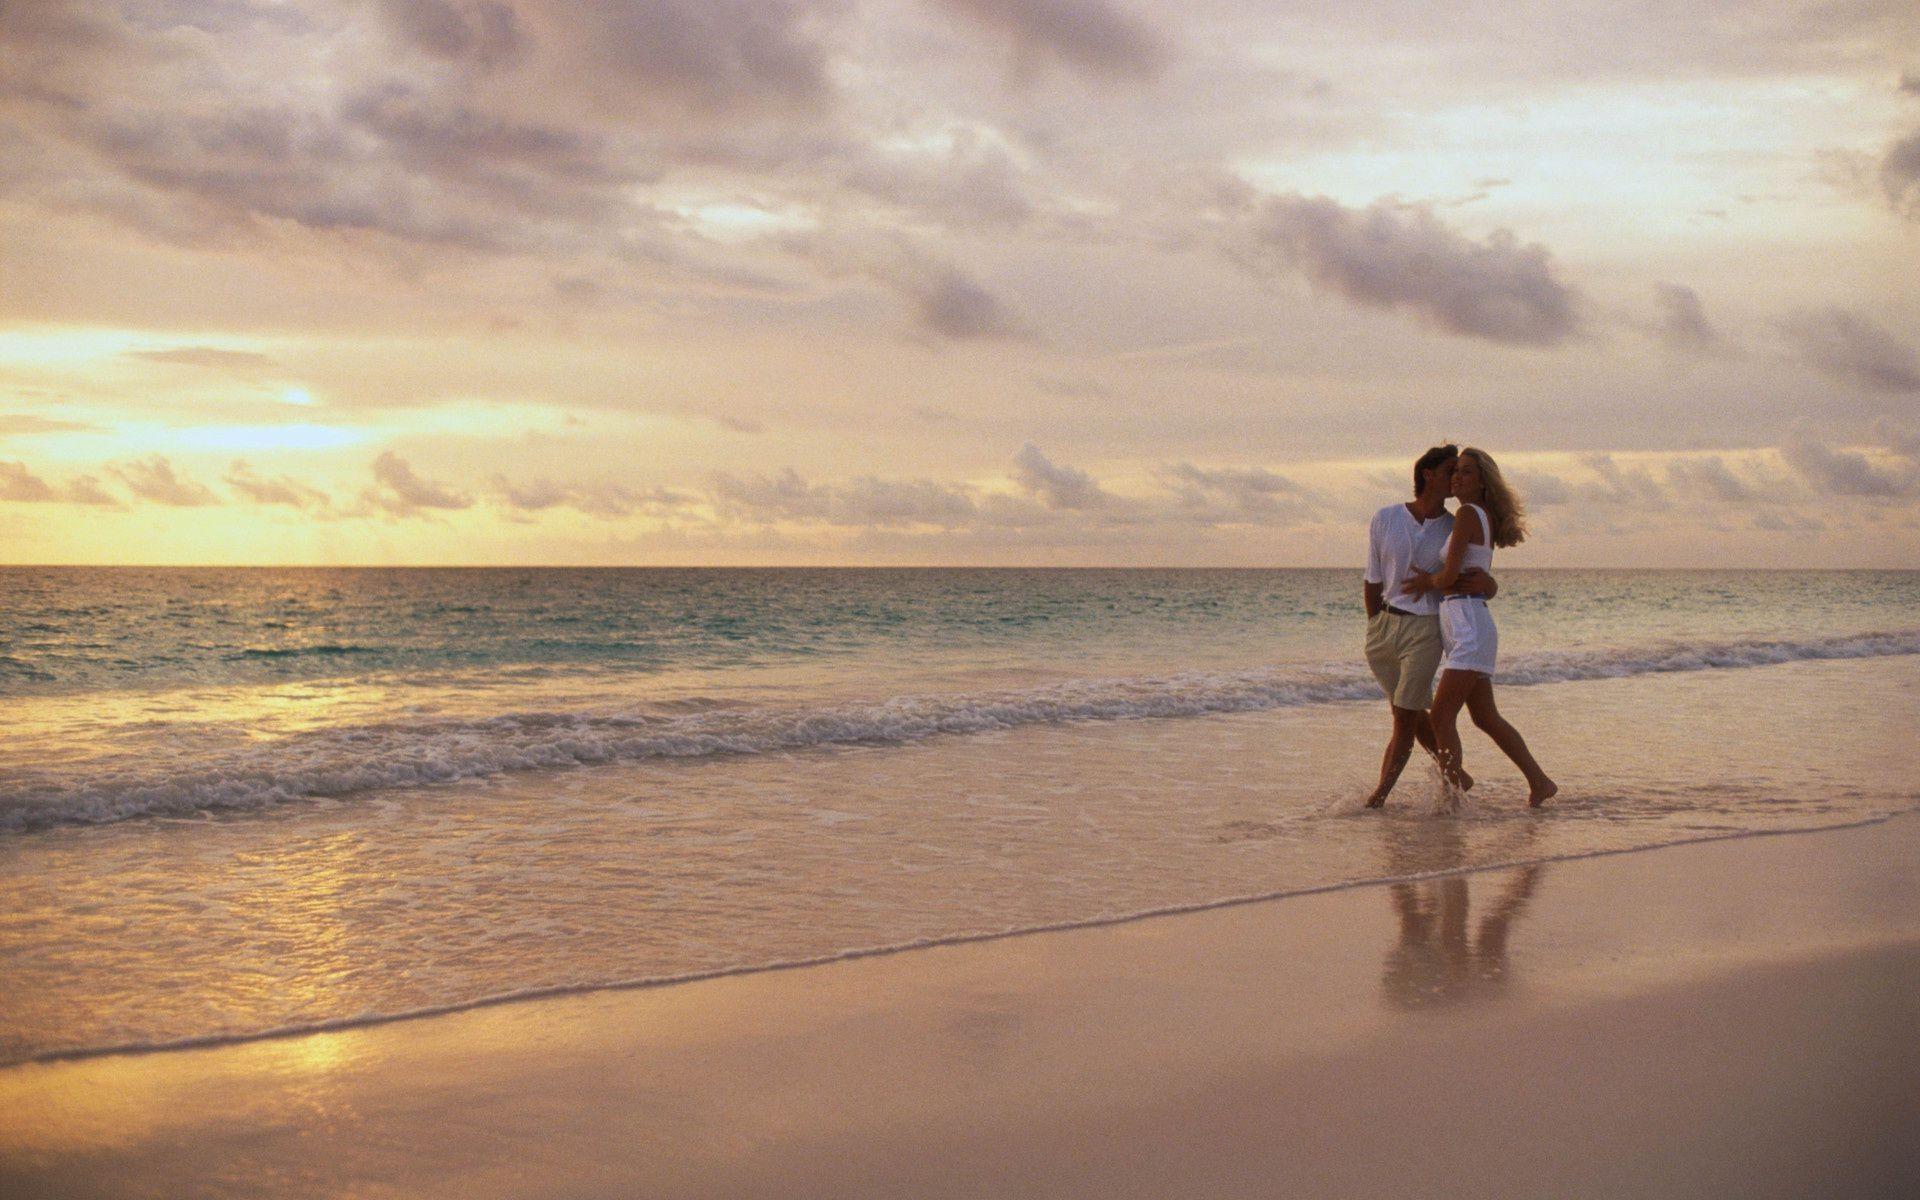 Жена гуляет по берегу, секс автобус в контакте